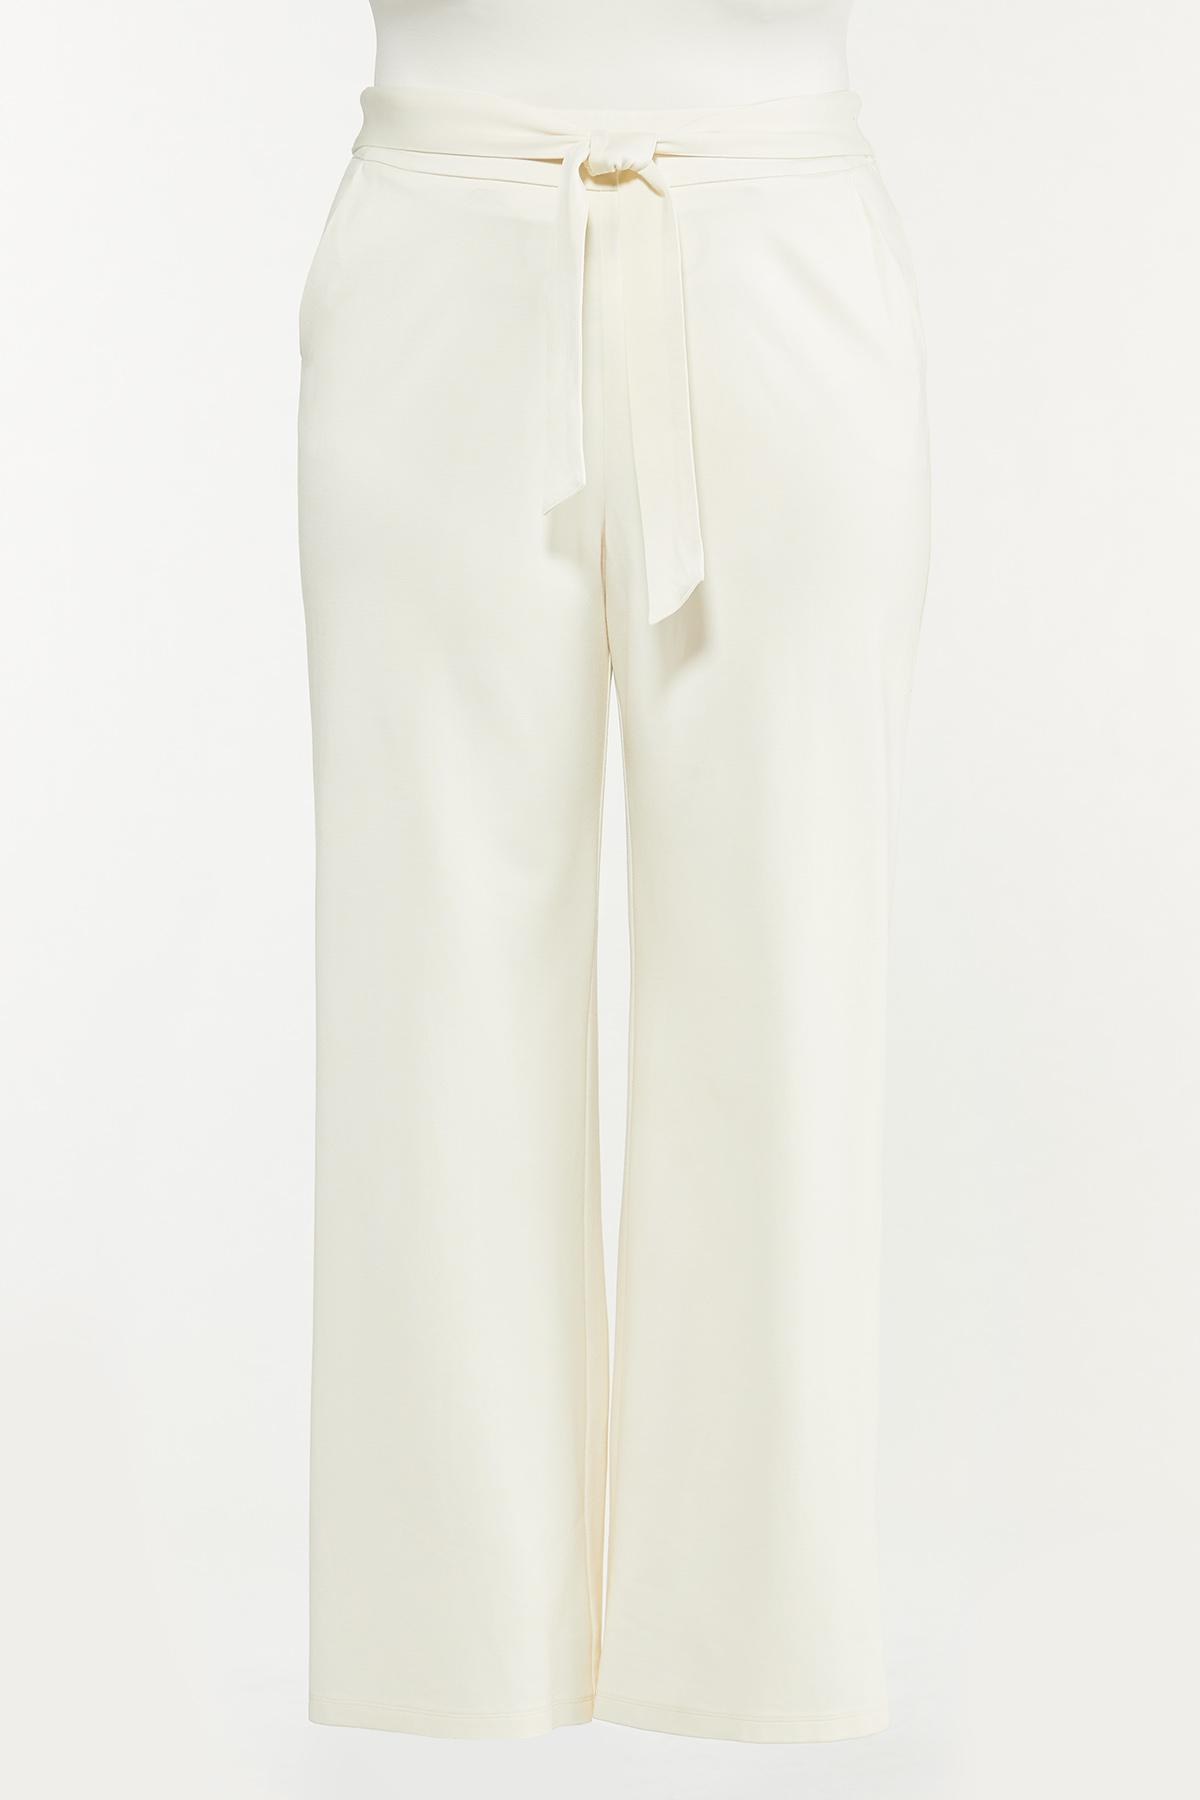 Plus Size Tie Waist Ponte Pants